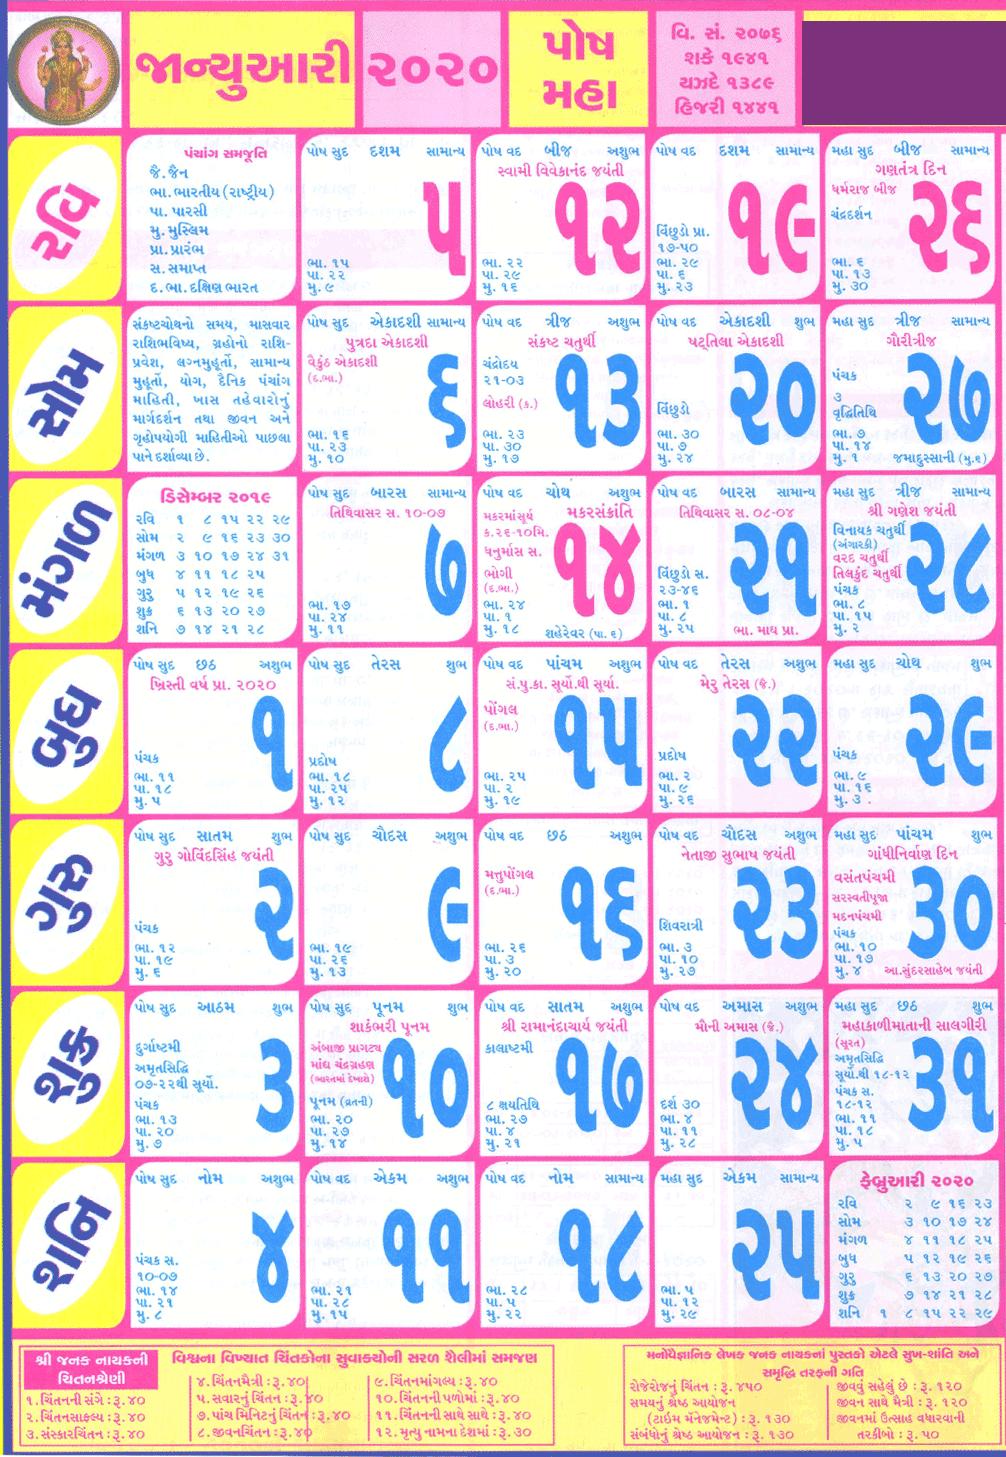 Gujarati Calendar 2020 Pdf Free Download | Seg pertaining to February 2020 Calendar Gujarati